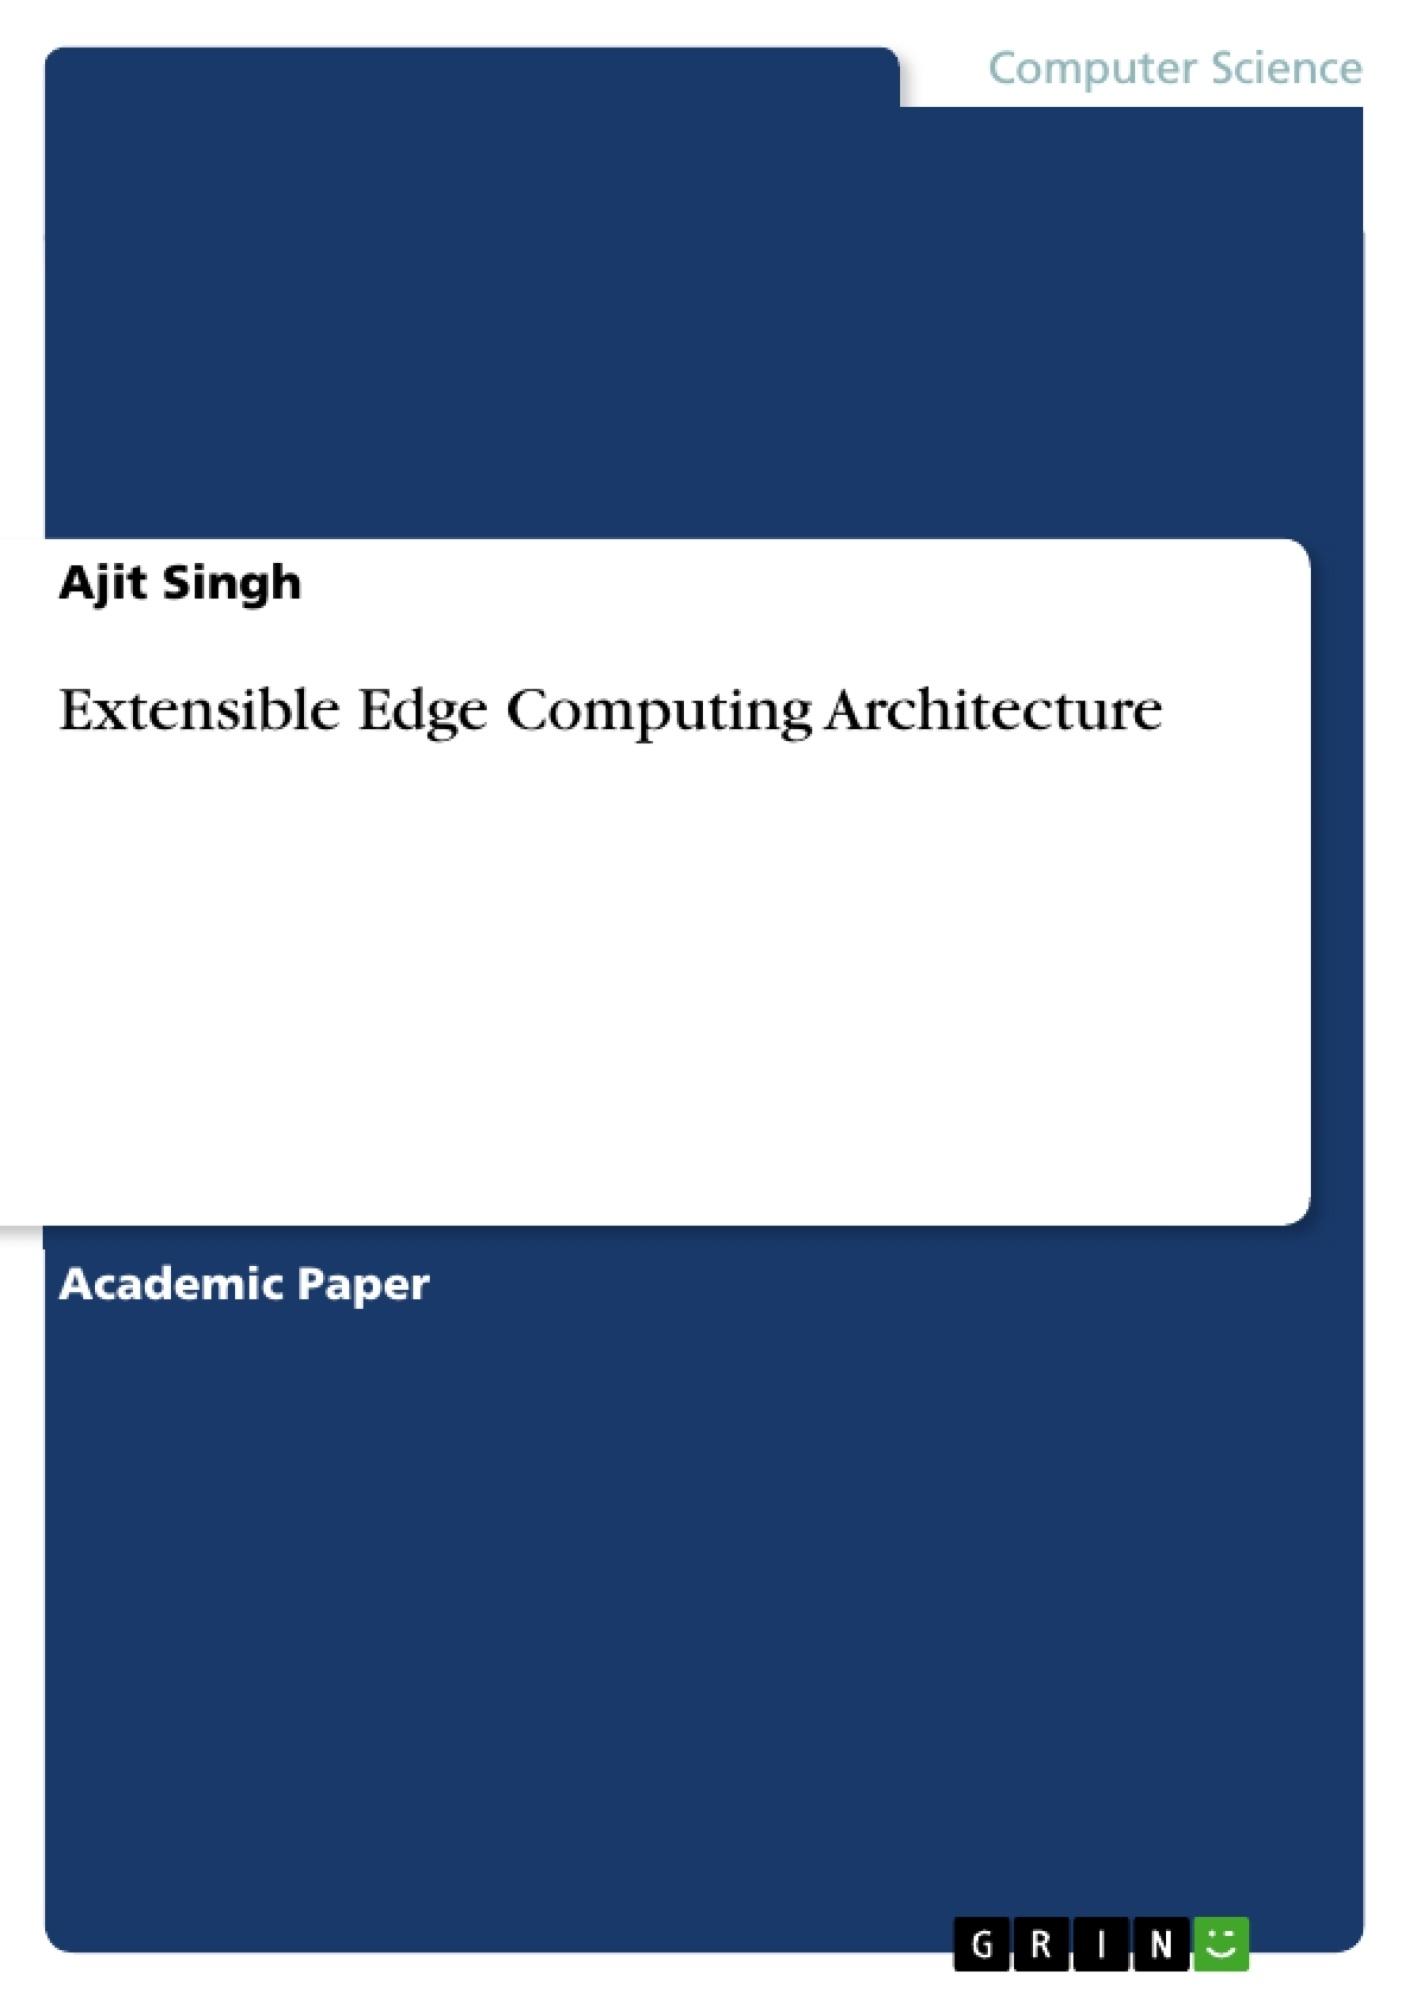 Title: Extensible Edge Computing Architecture